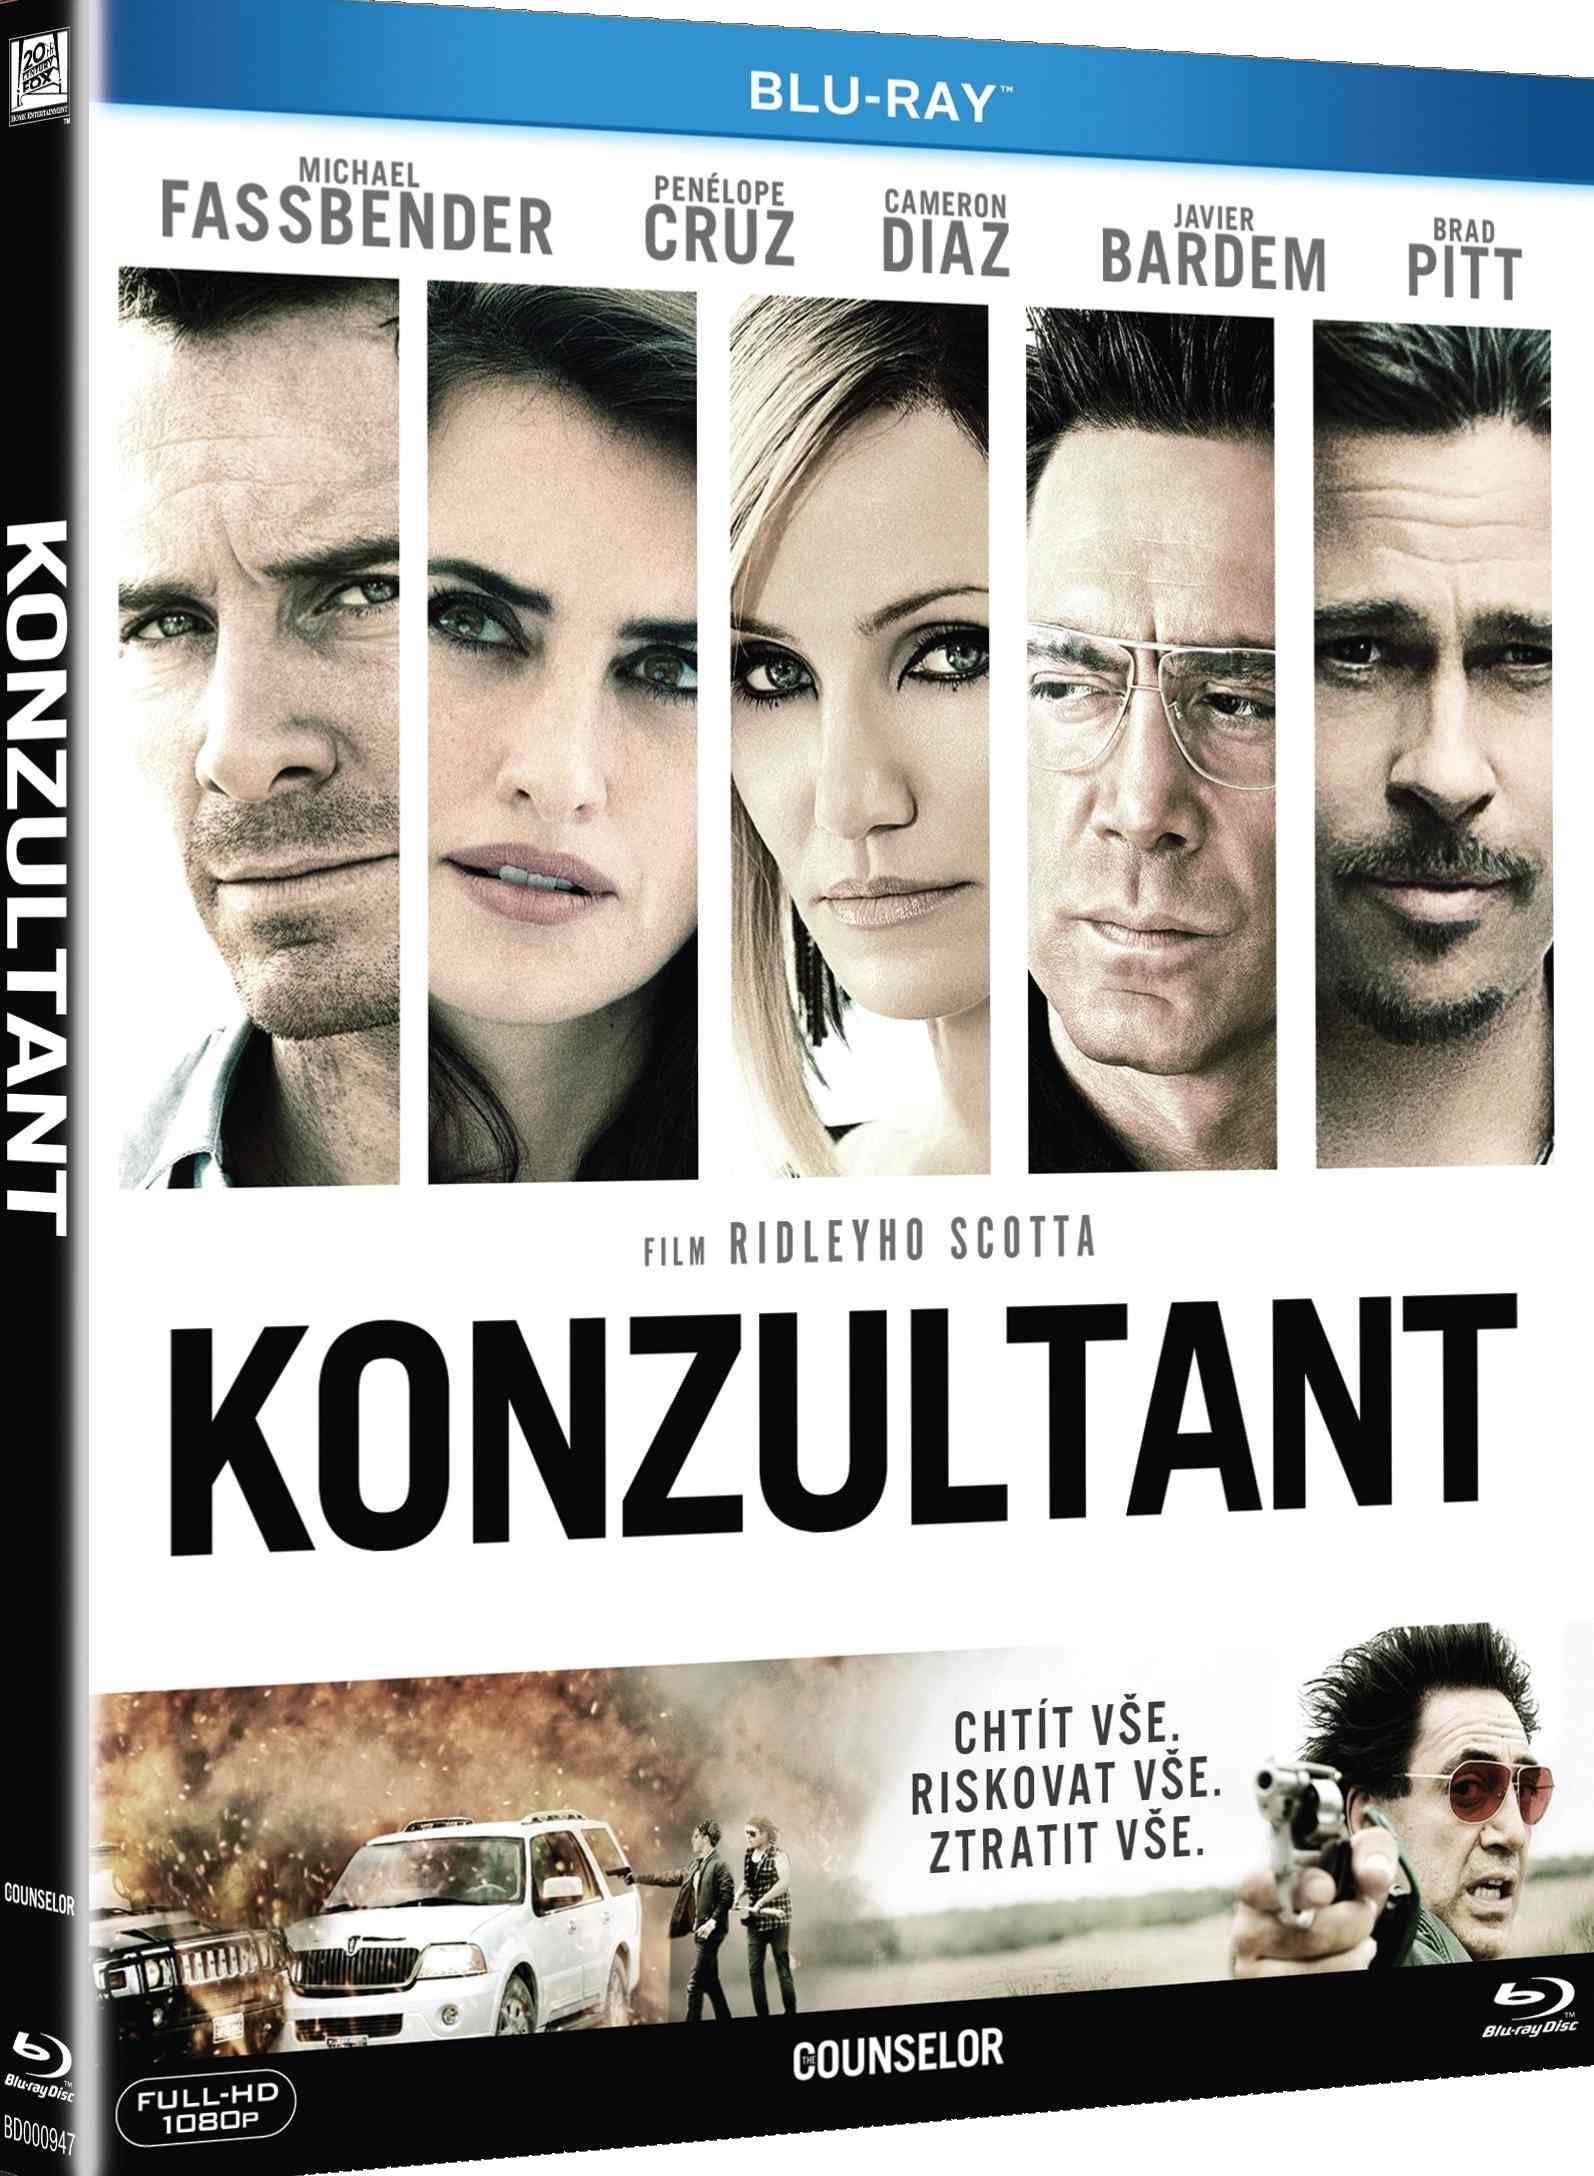 KONZULTANT - Blu-ray